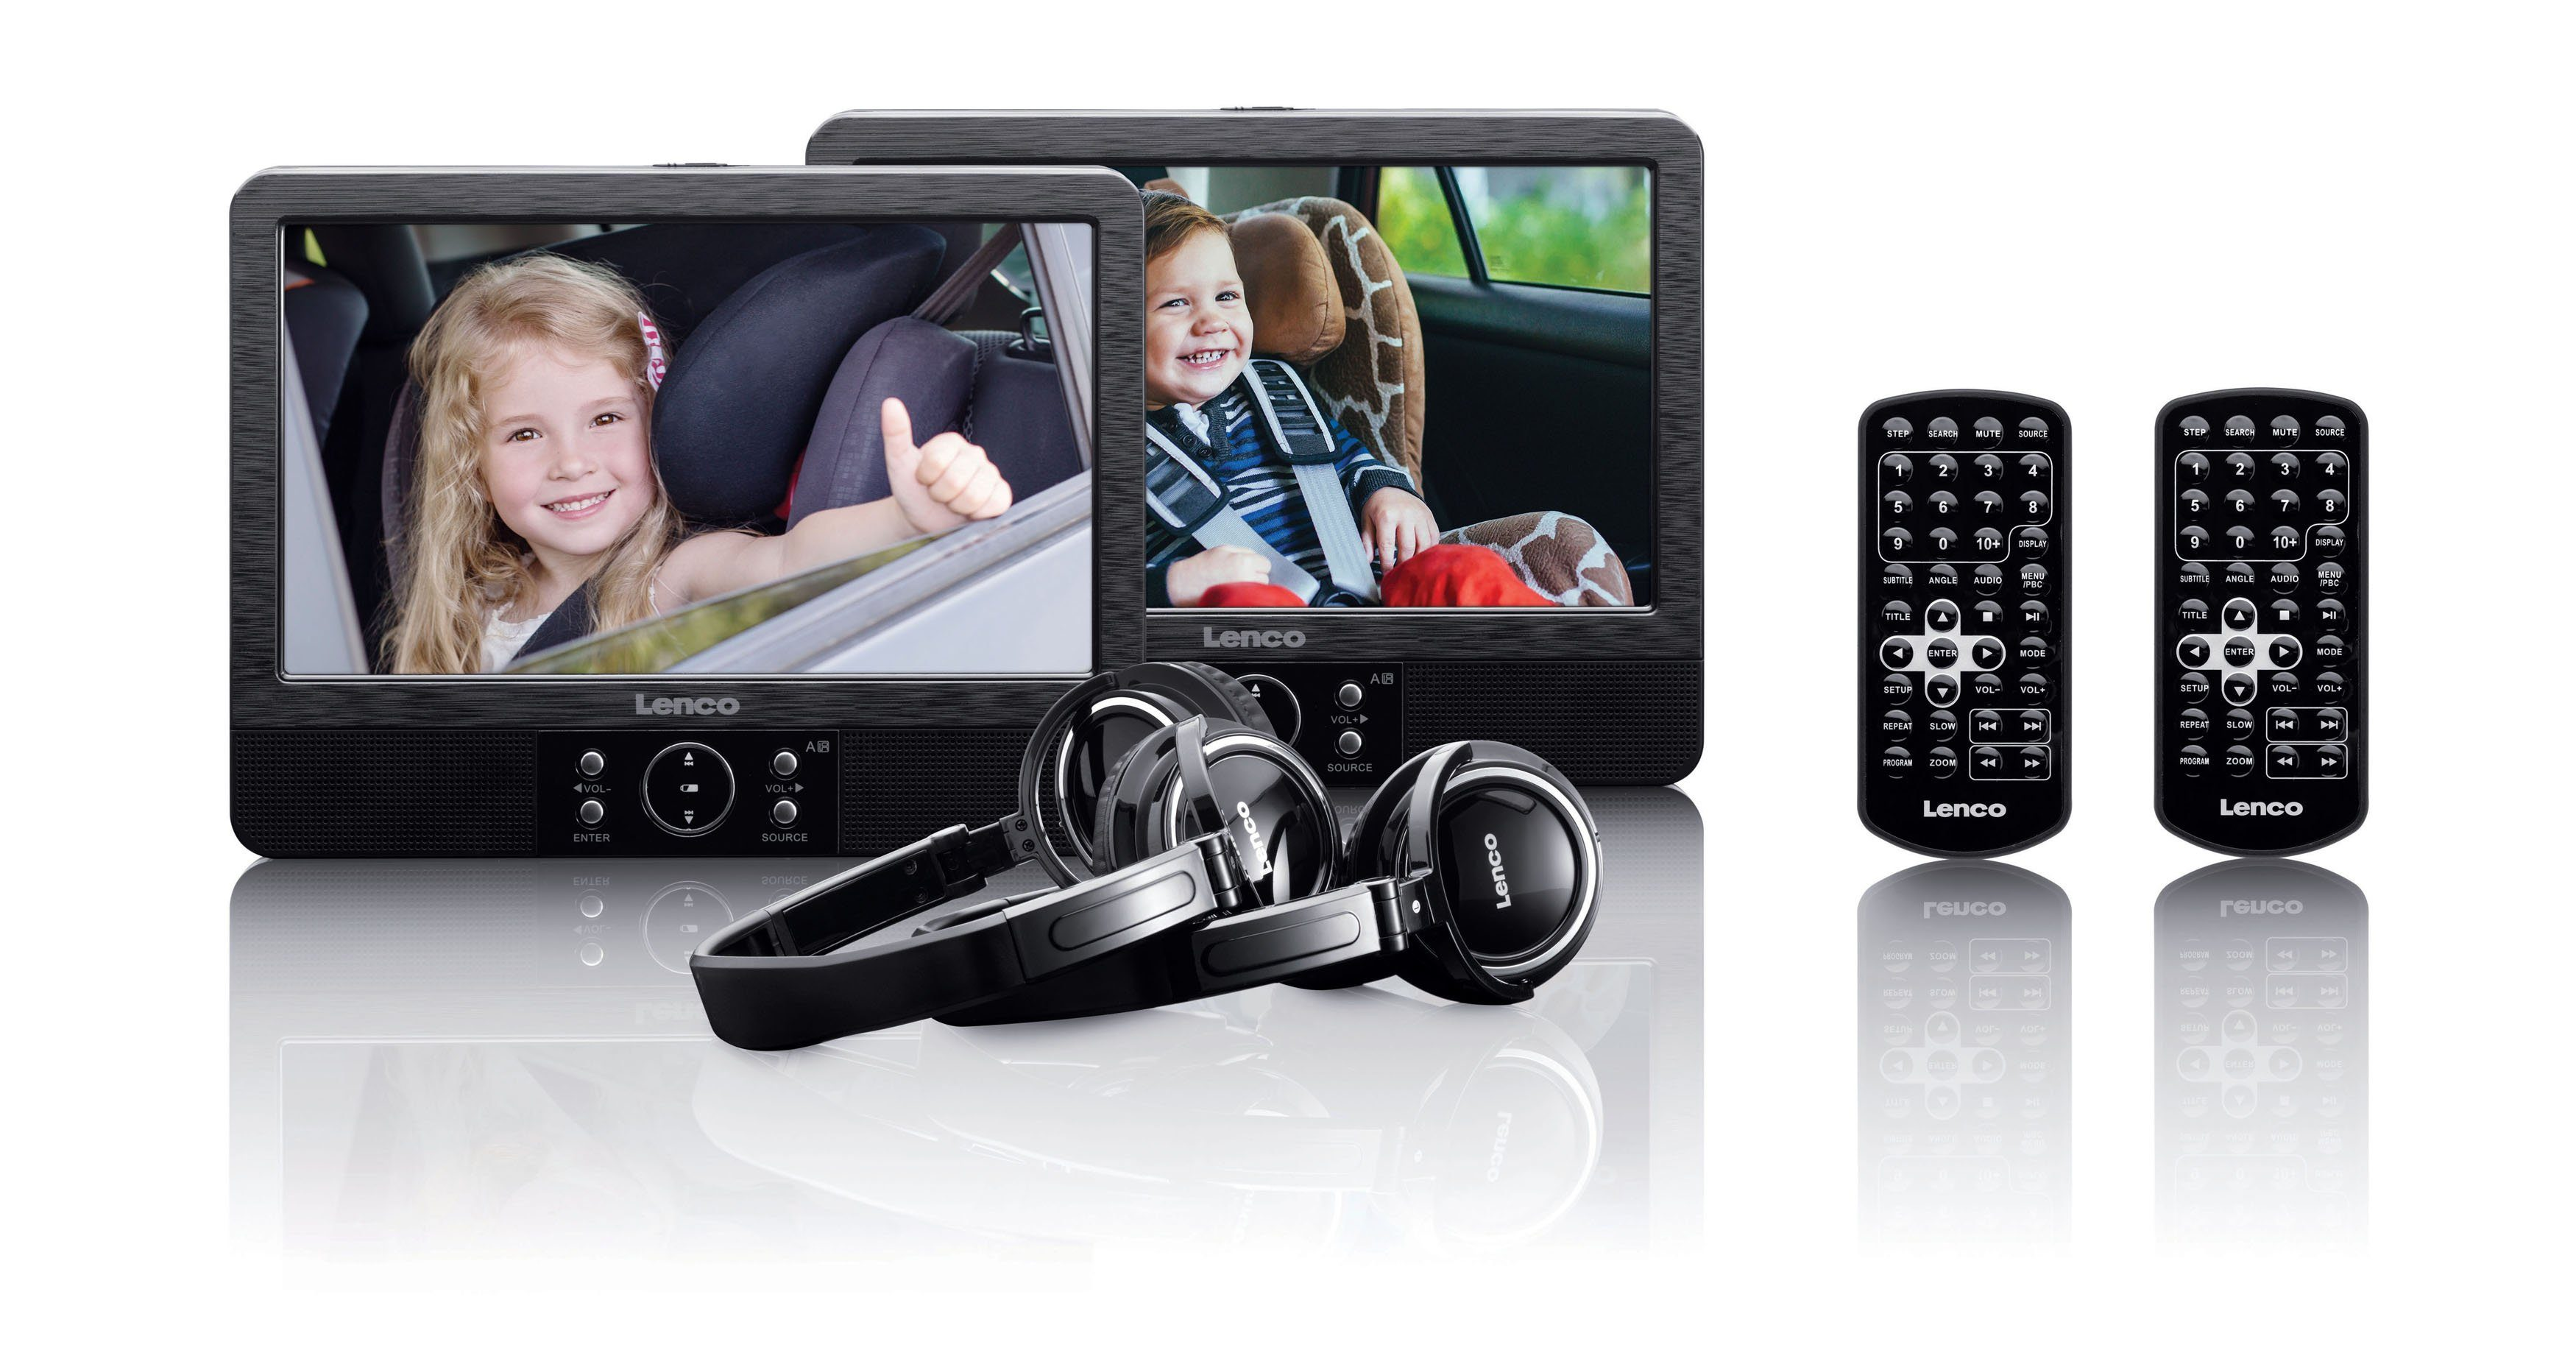 Lenco Tragbares DVD-Player Set mit Halterung per Spange »DVP-939«